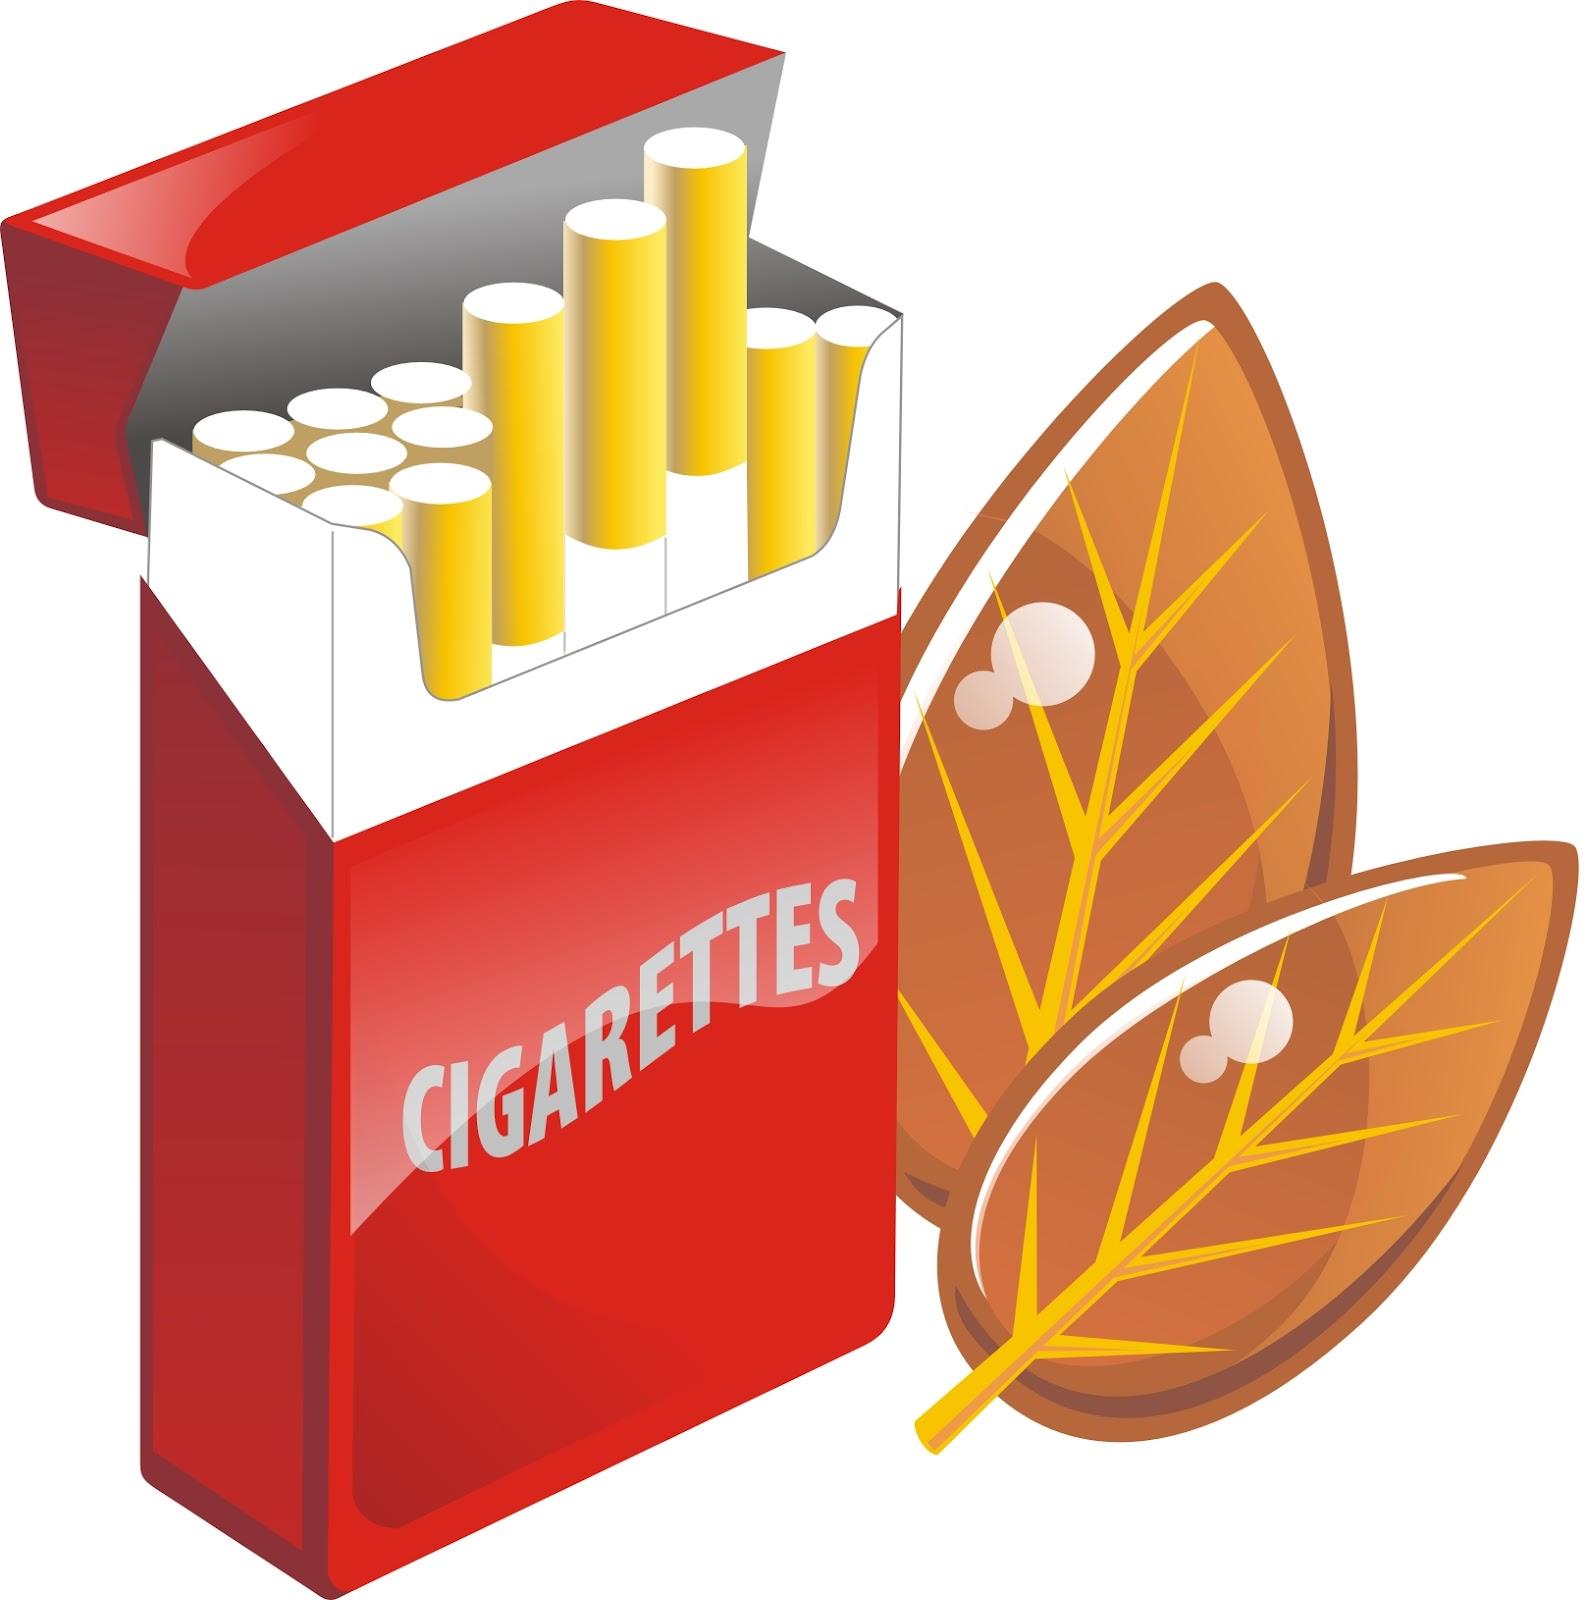 Cigarette Logos